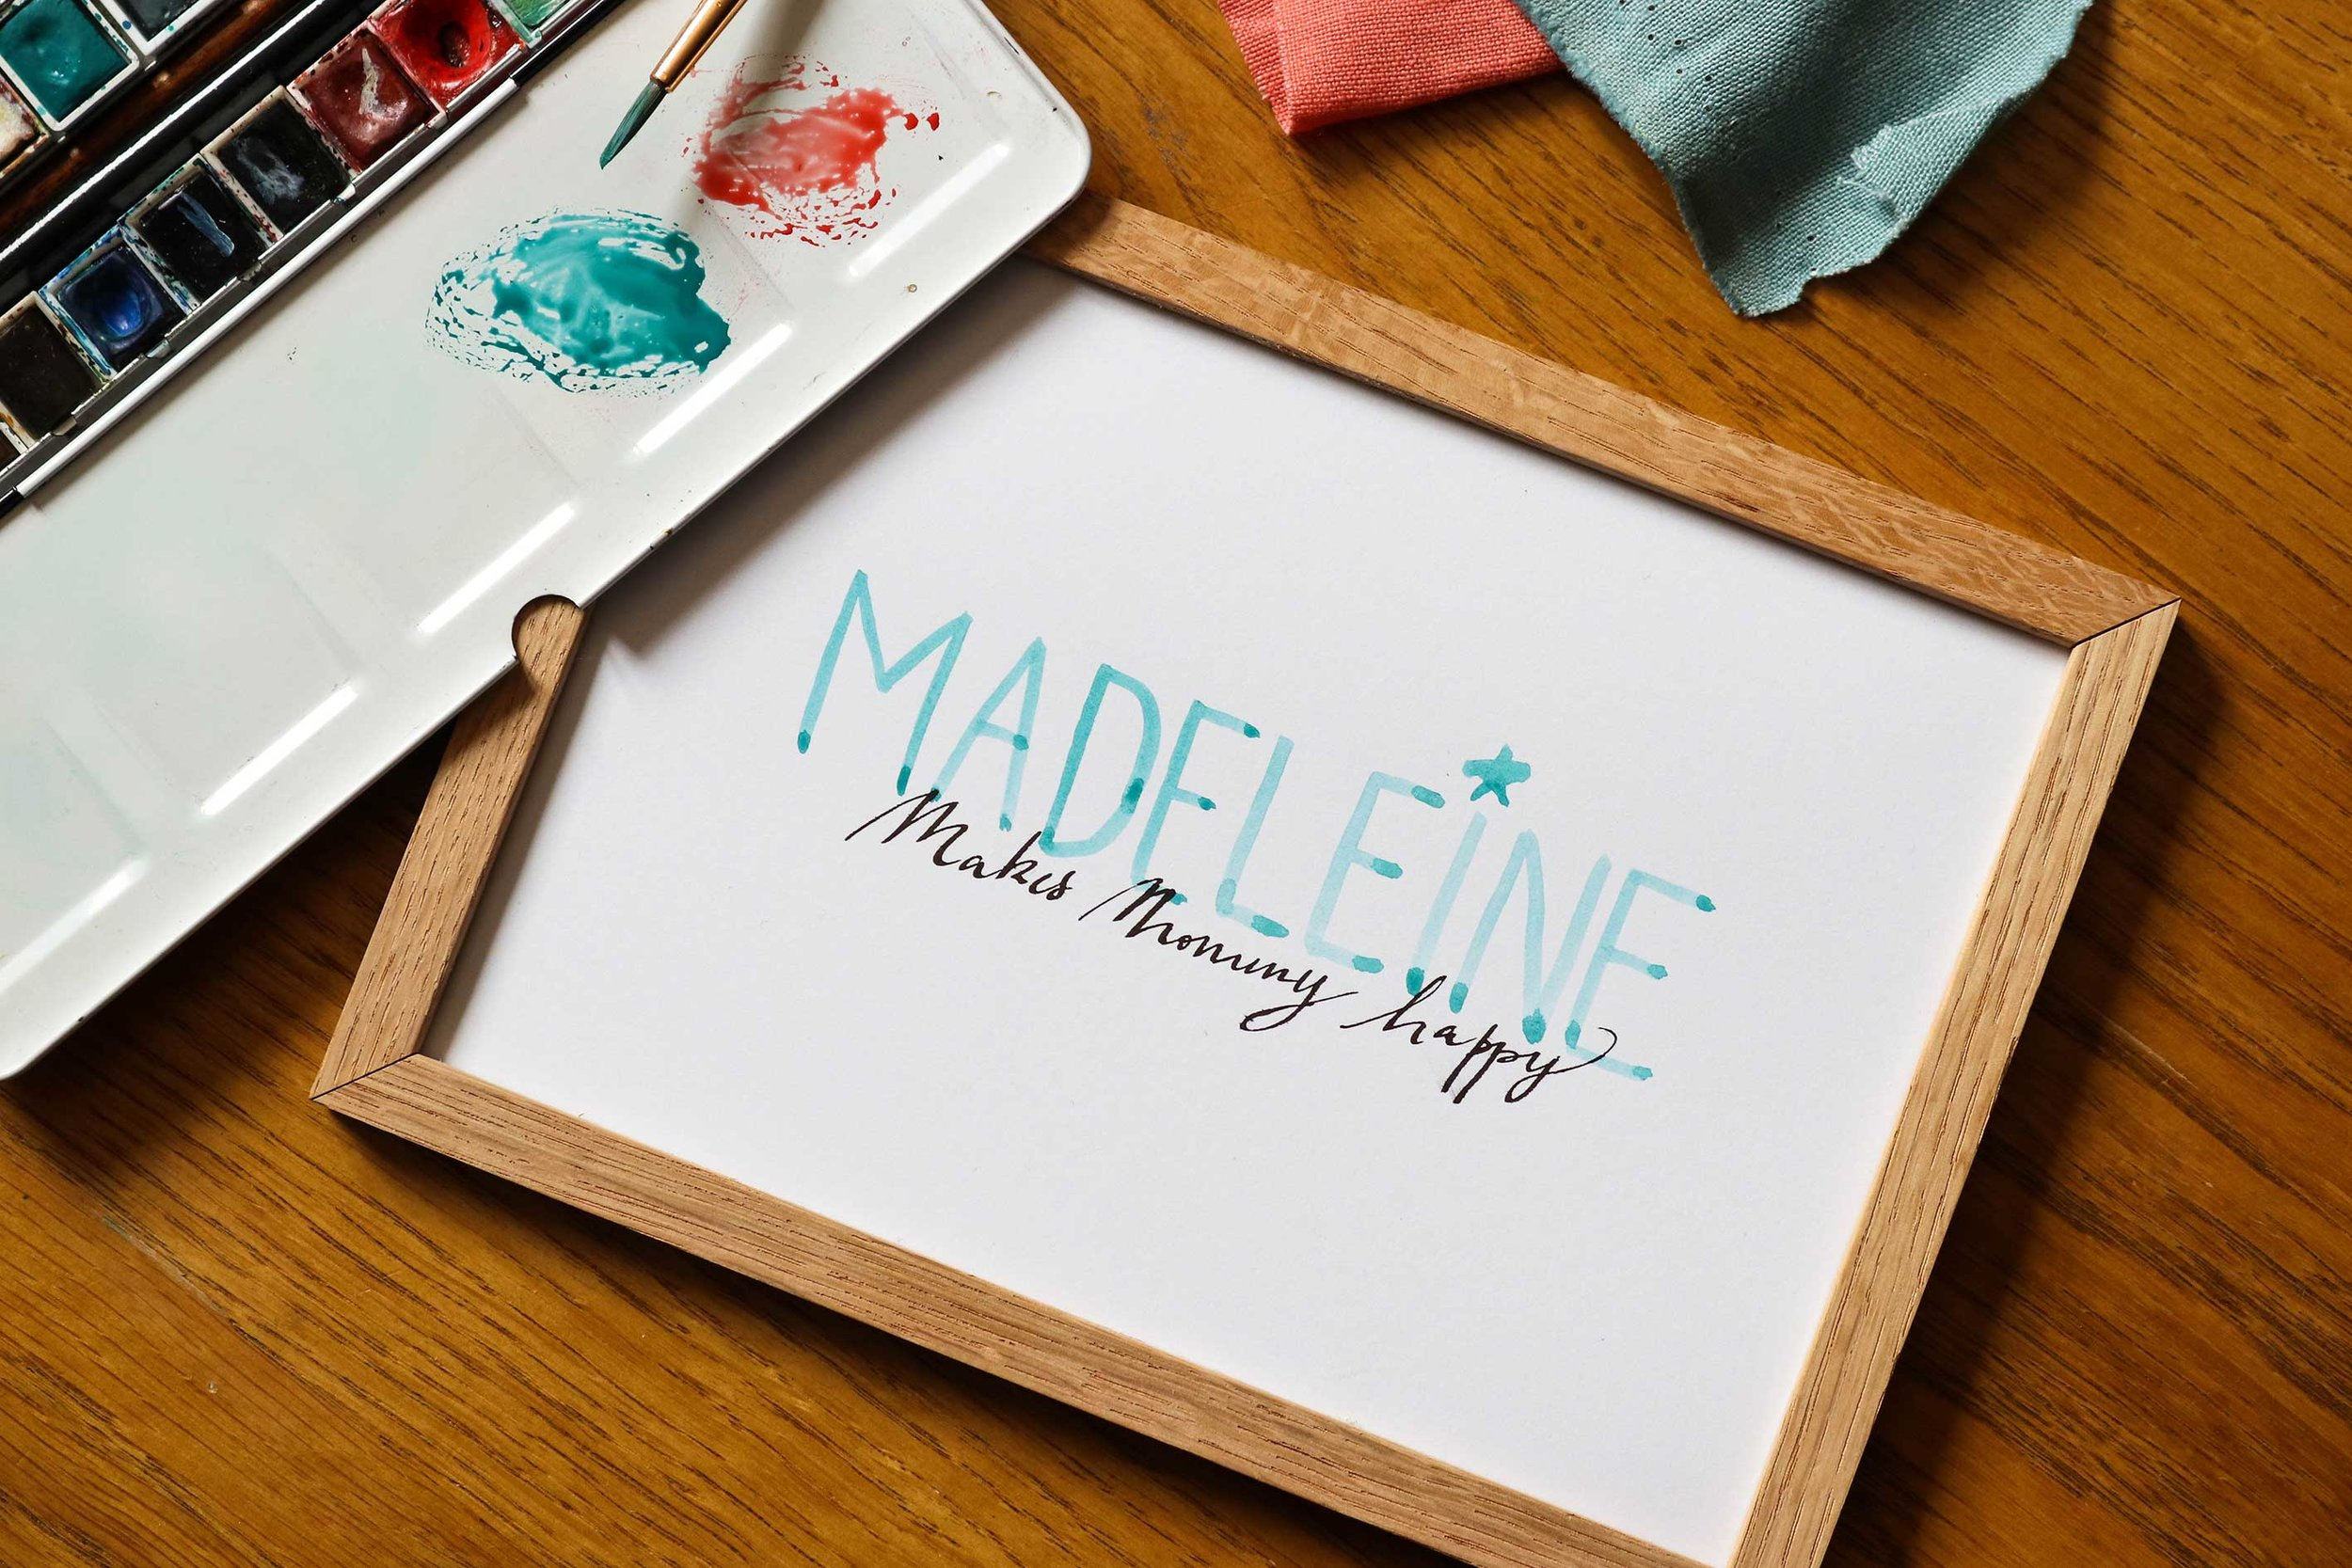 Ralanto-studio-calligraphie-collaboration-petit-picotin-prenom-madeleine.jpg